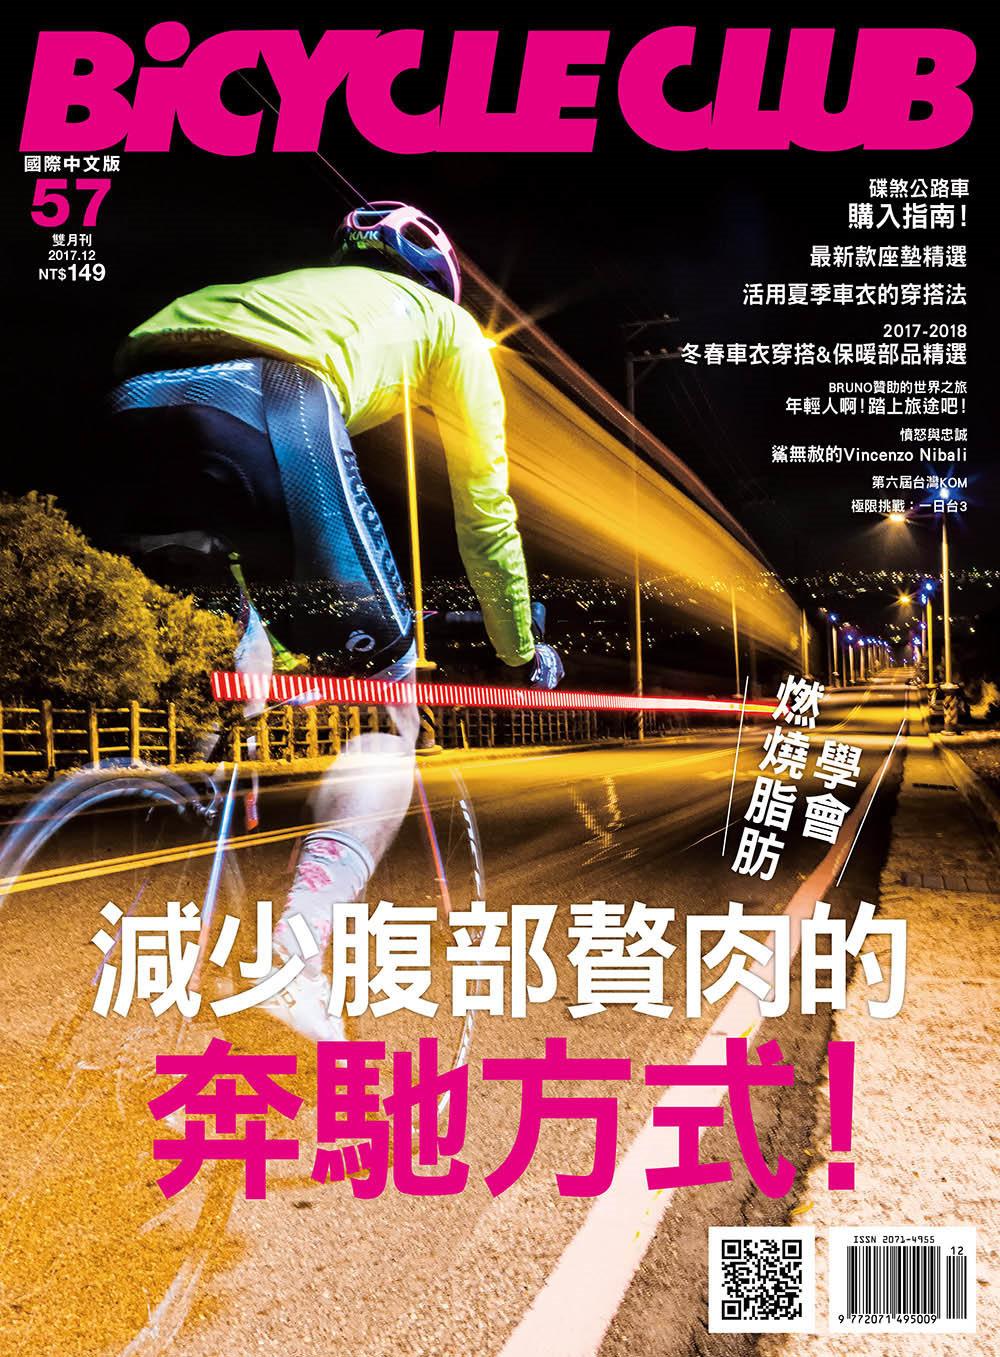 bicycle club單車俱樂部 12月號/2017第57期